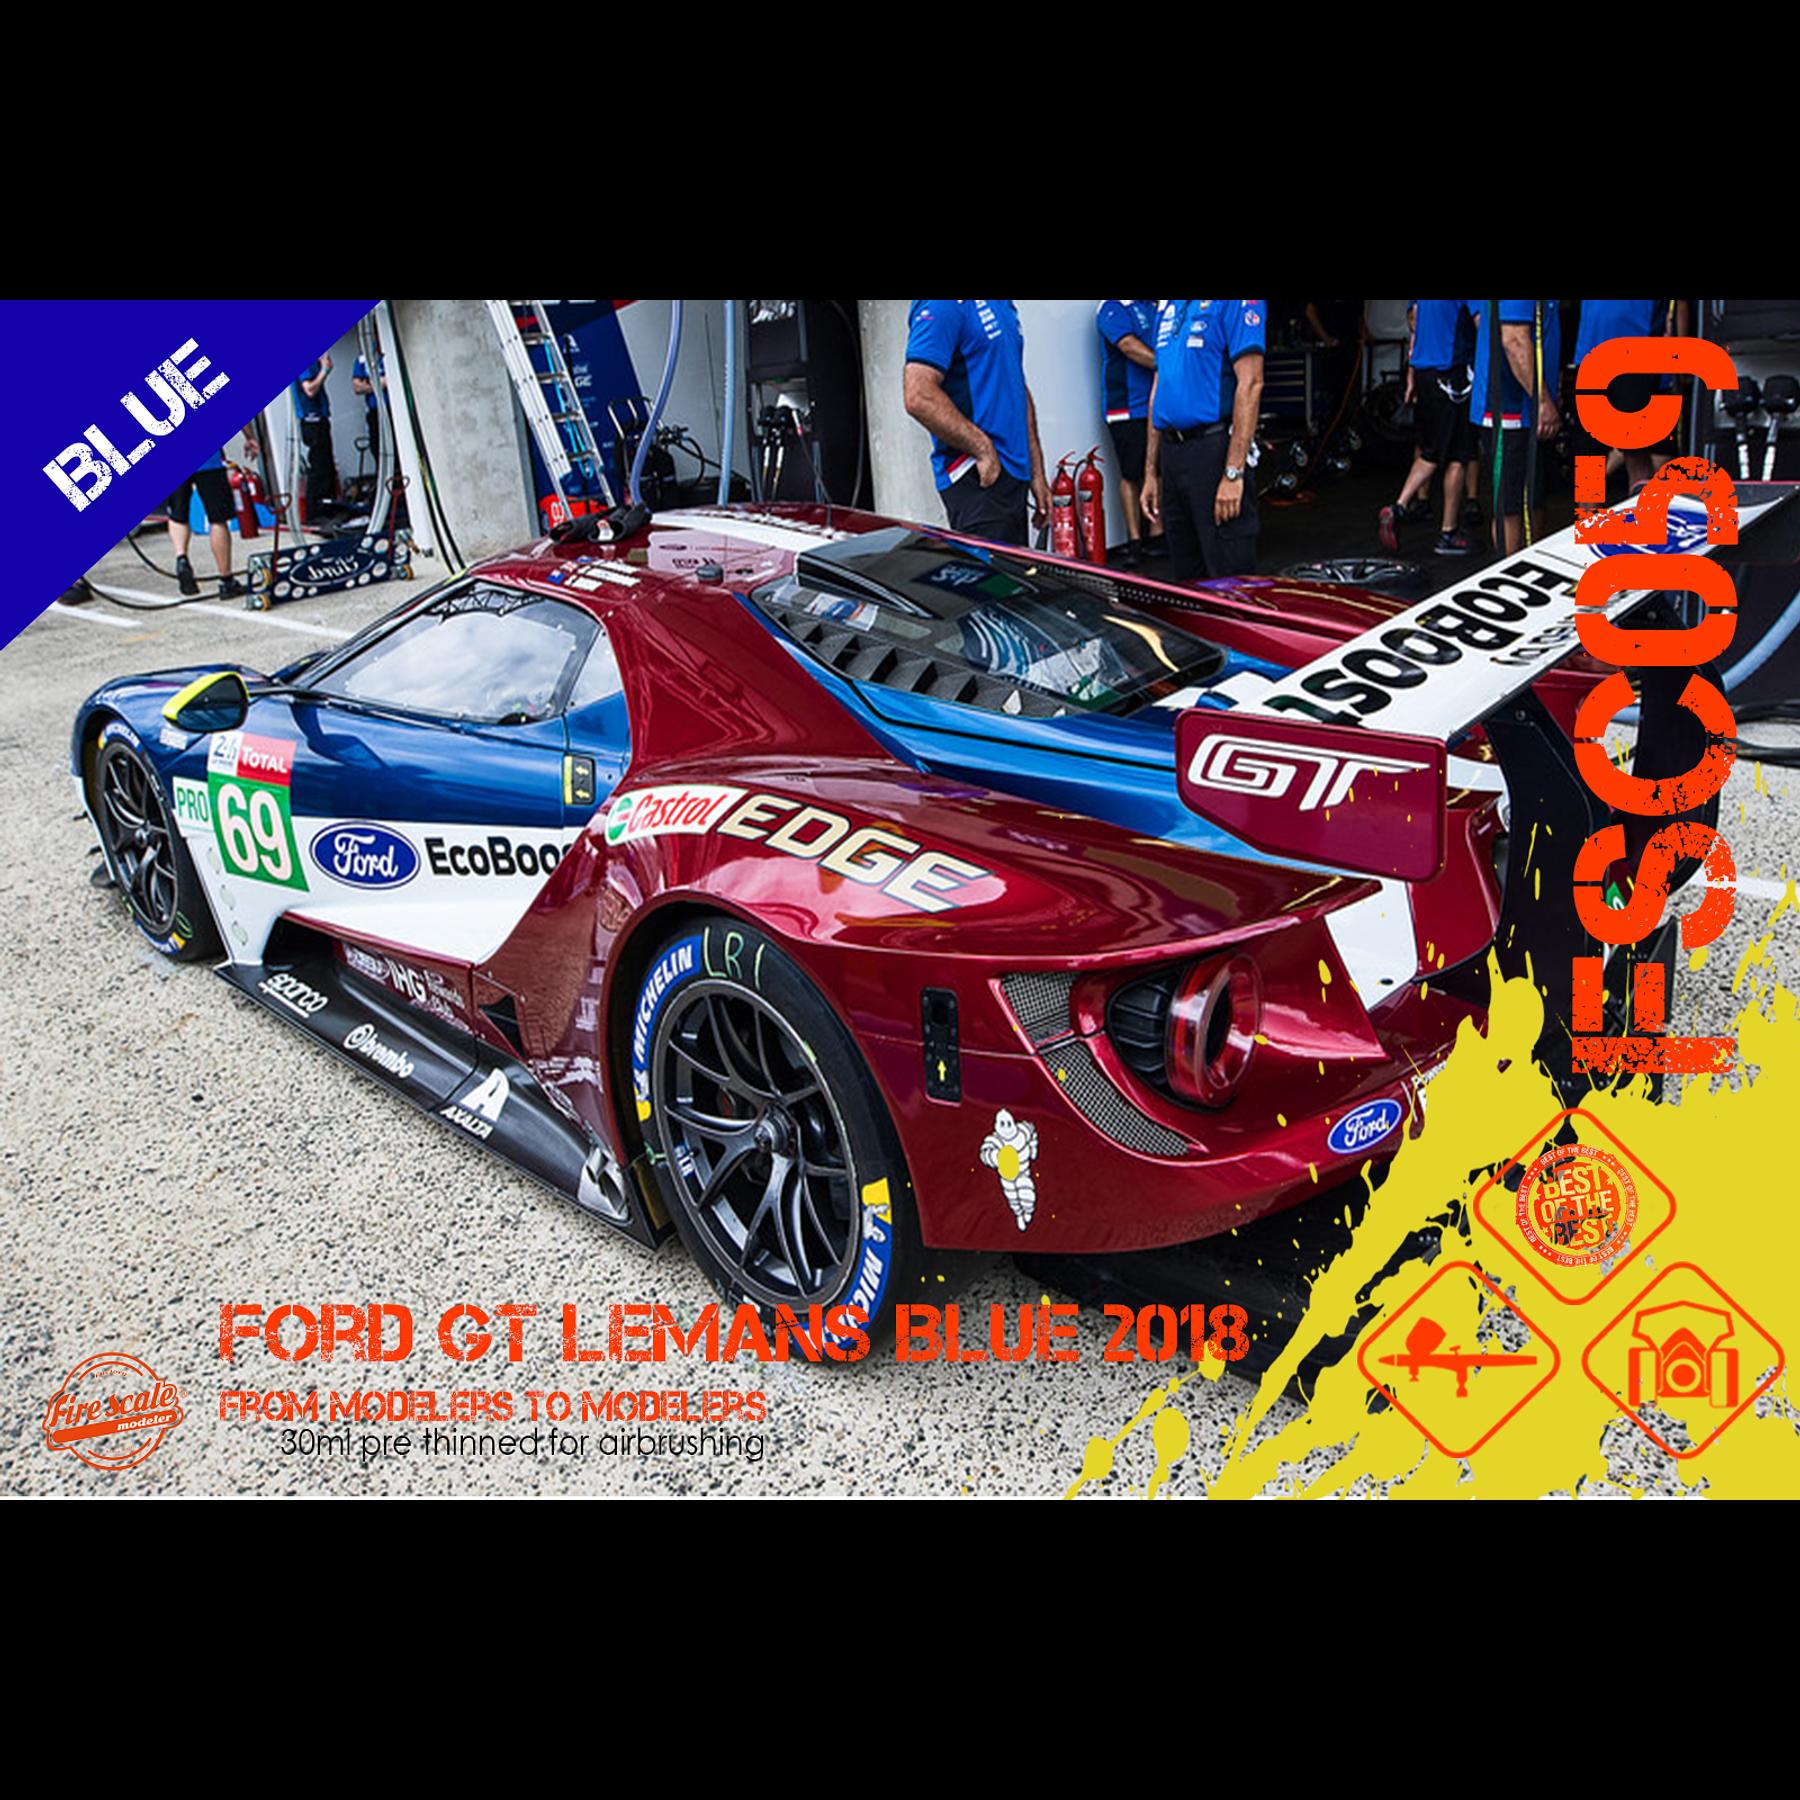 Ford GT Le mans 2018 Blue